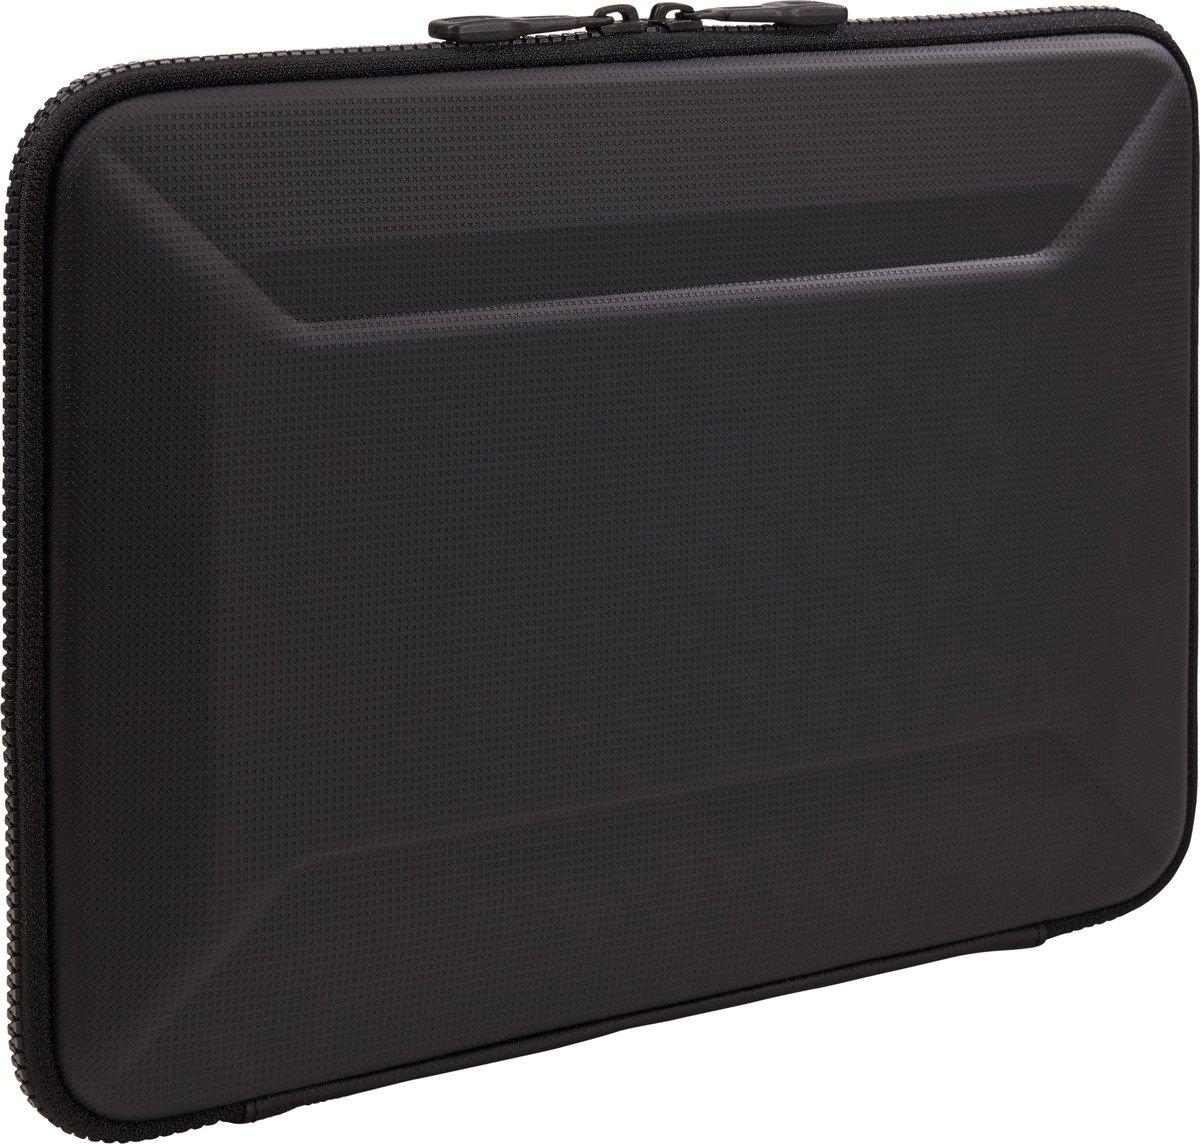 "Etui, Case na Macbook 15"" Thule Gauntlet - czarny"